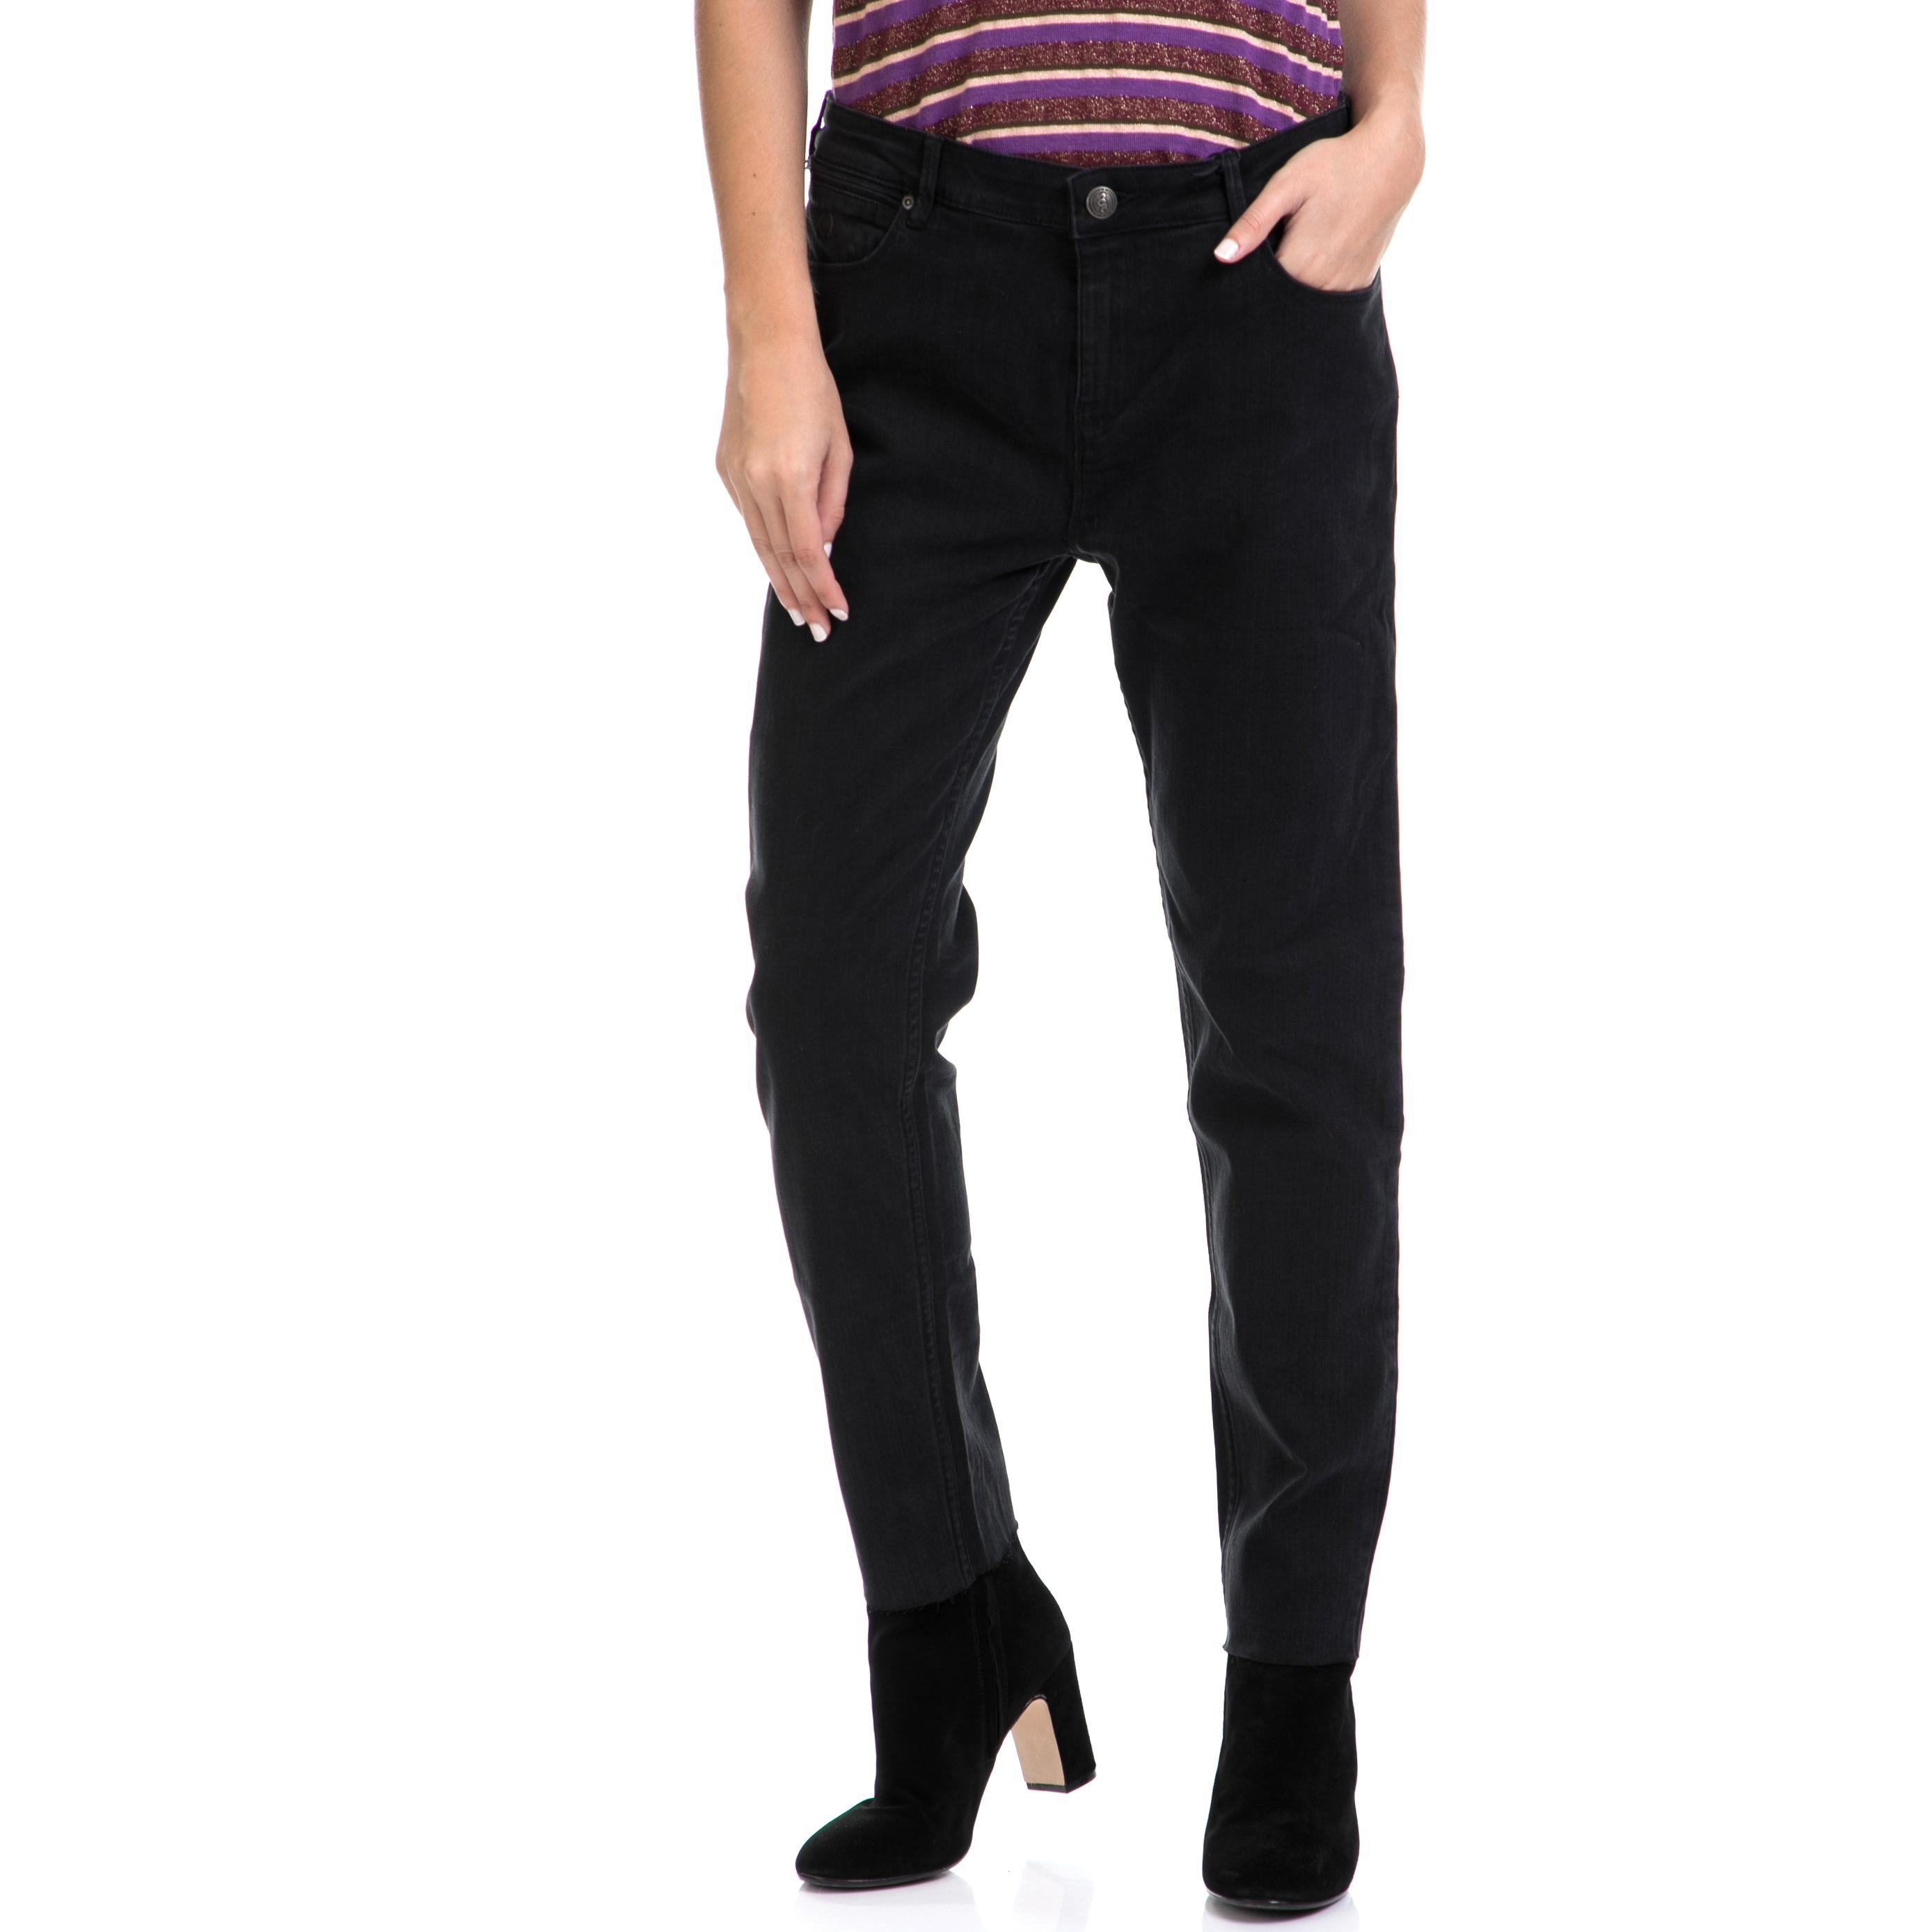 SCOTCH & SODA - Γυναικείο παντελόνι Petit Ami - Precious Rock MAISON SCOTCH μαύρ γυναικεία ρούχα παντελόνια